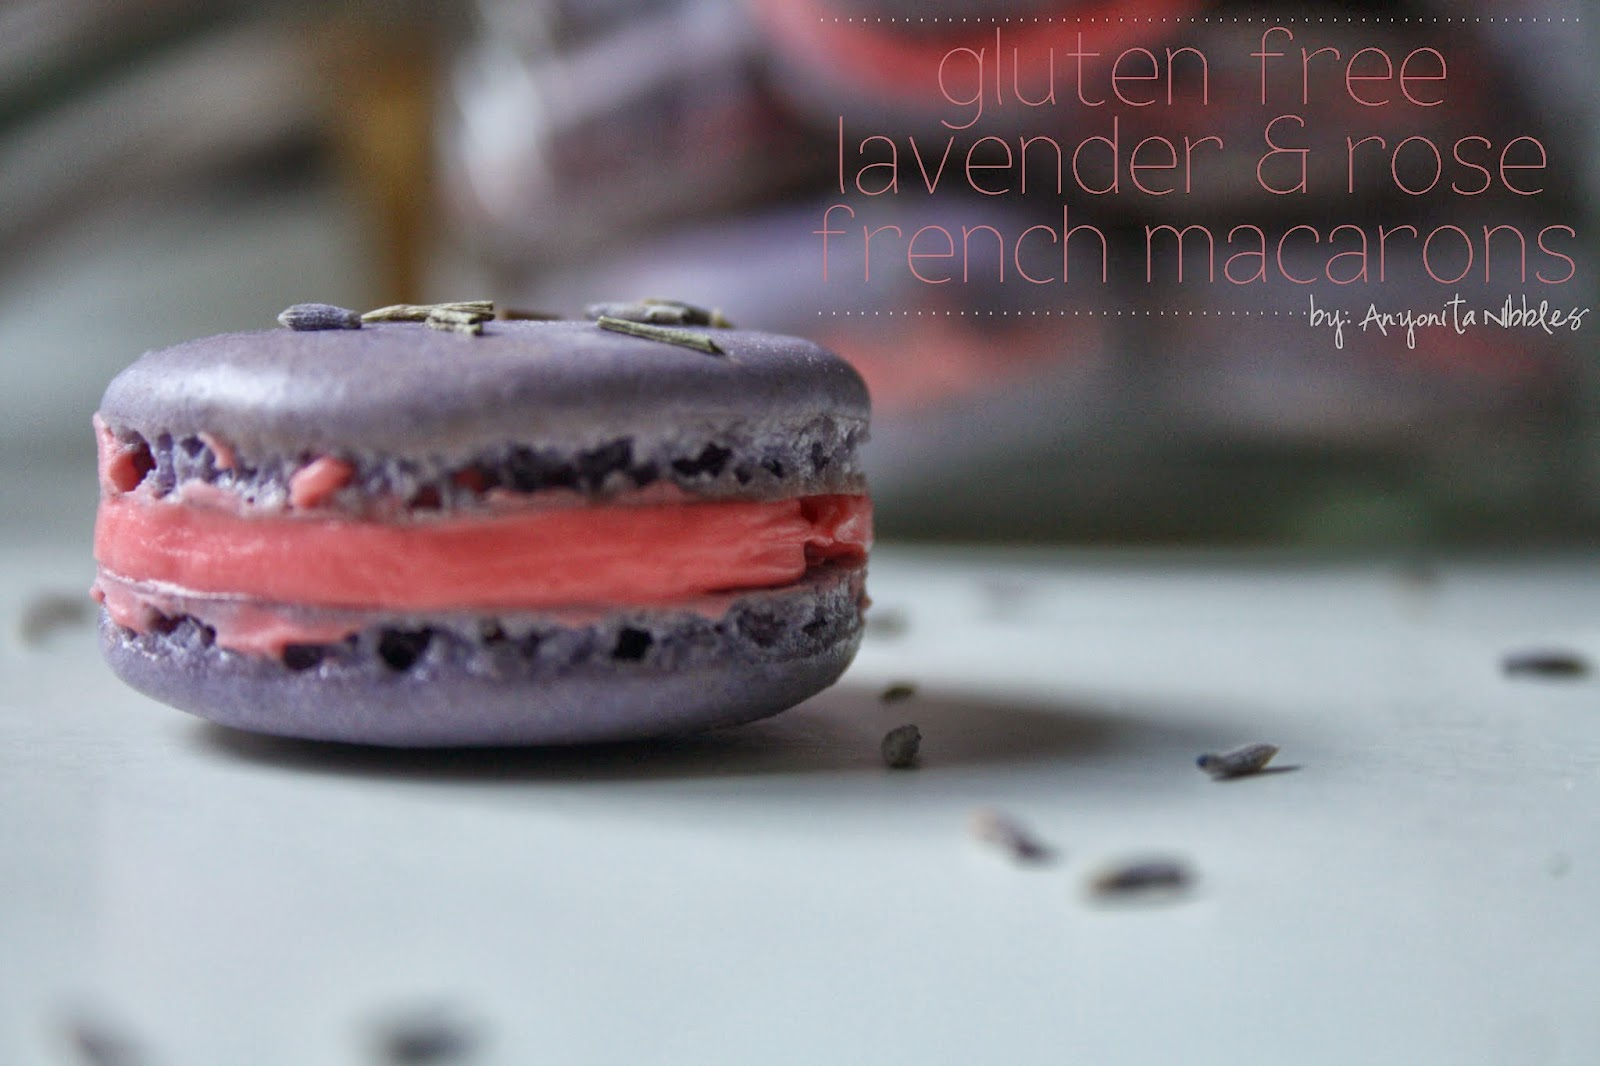 Gluten Free Lavender & Rose Frenhc Macarons